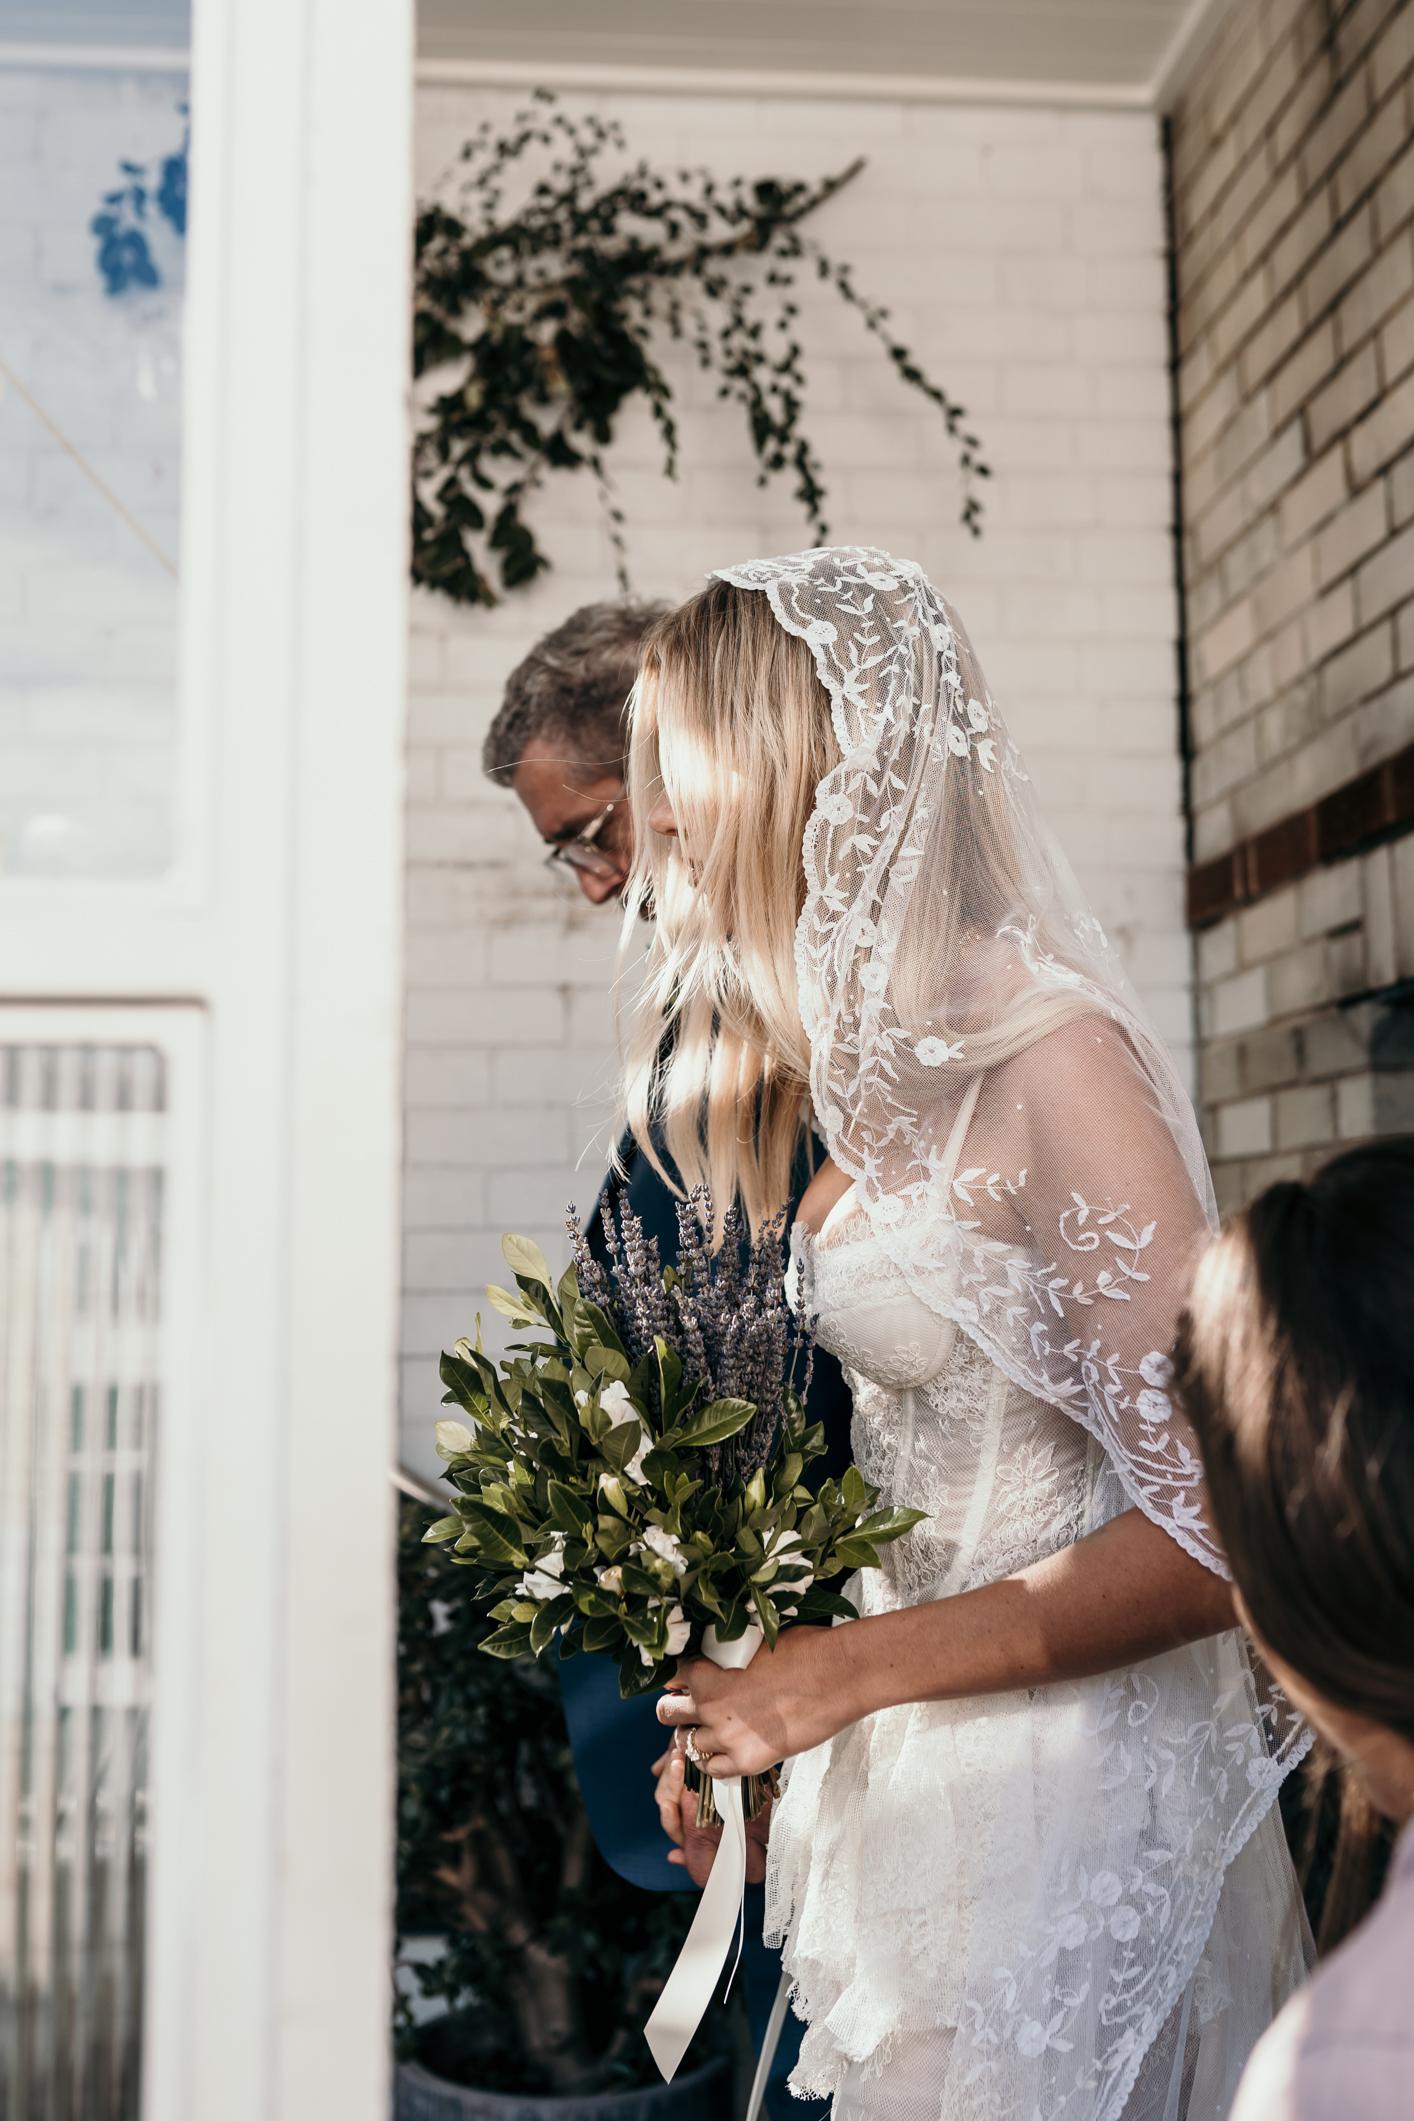 Copy of Cydney Morris and Ollie Edwards's Wedding